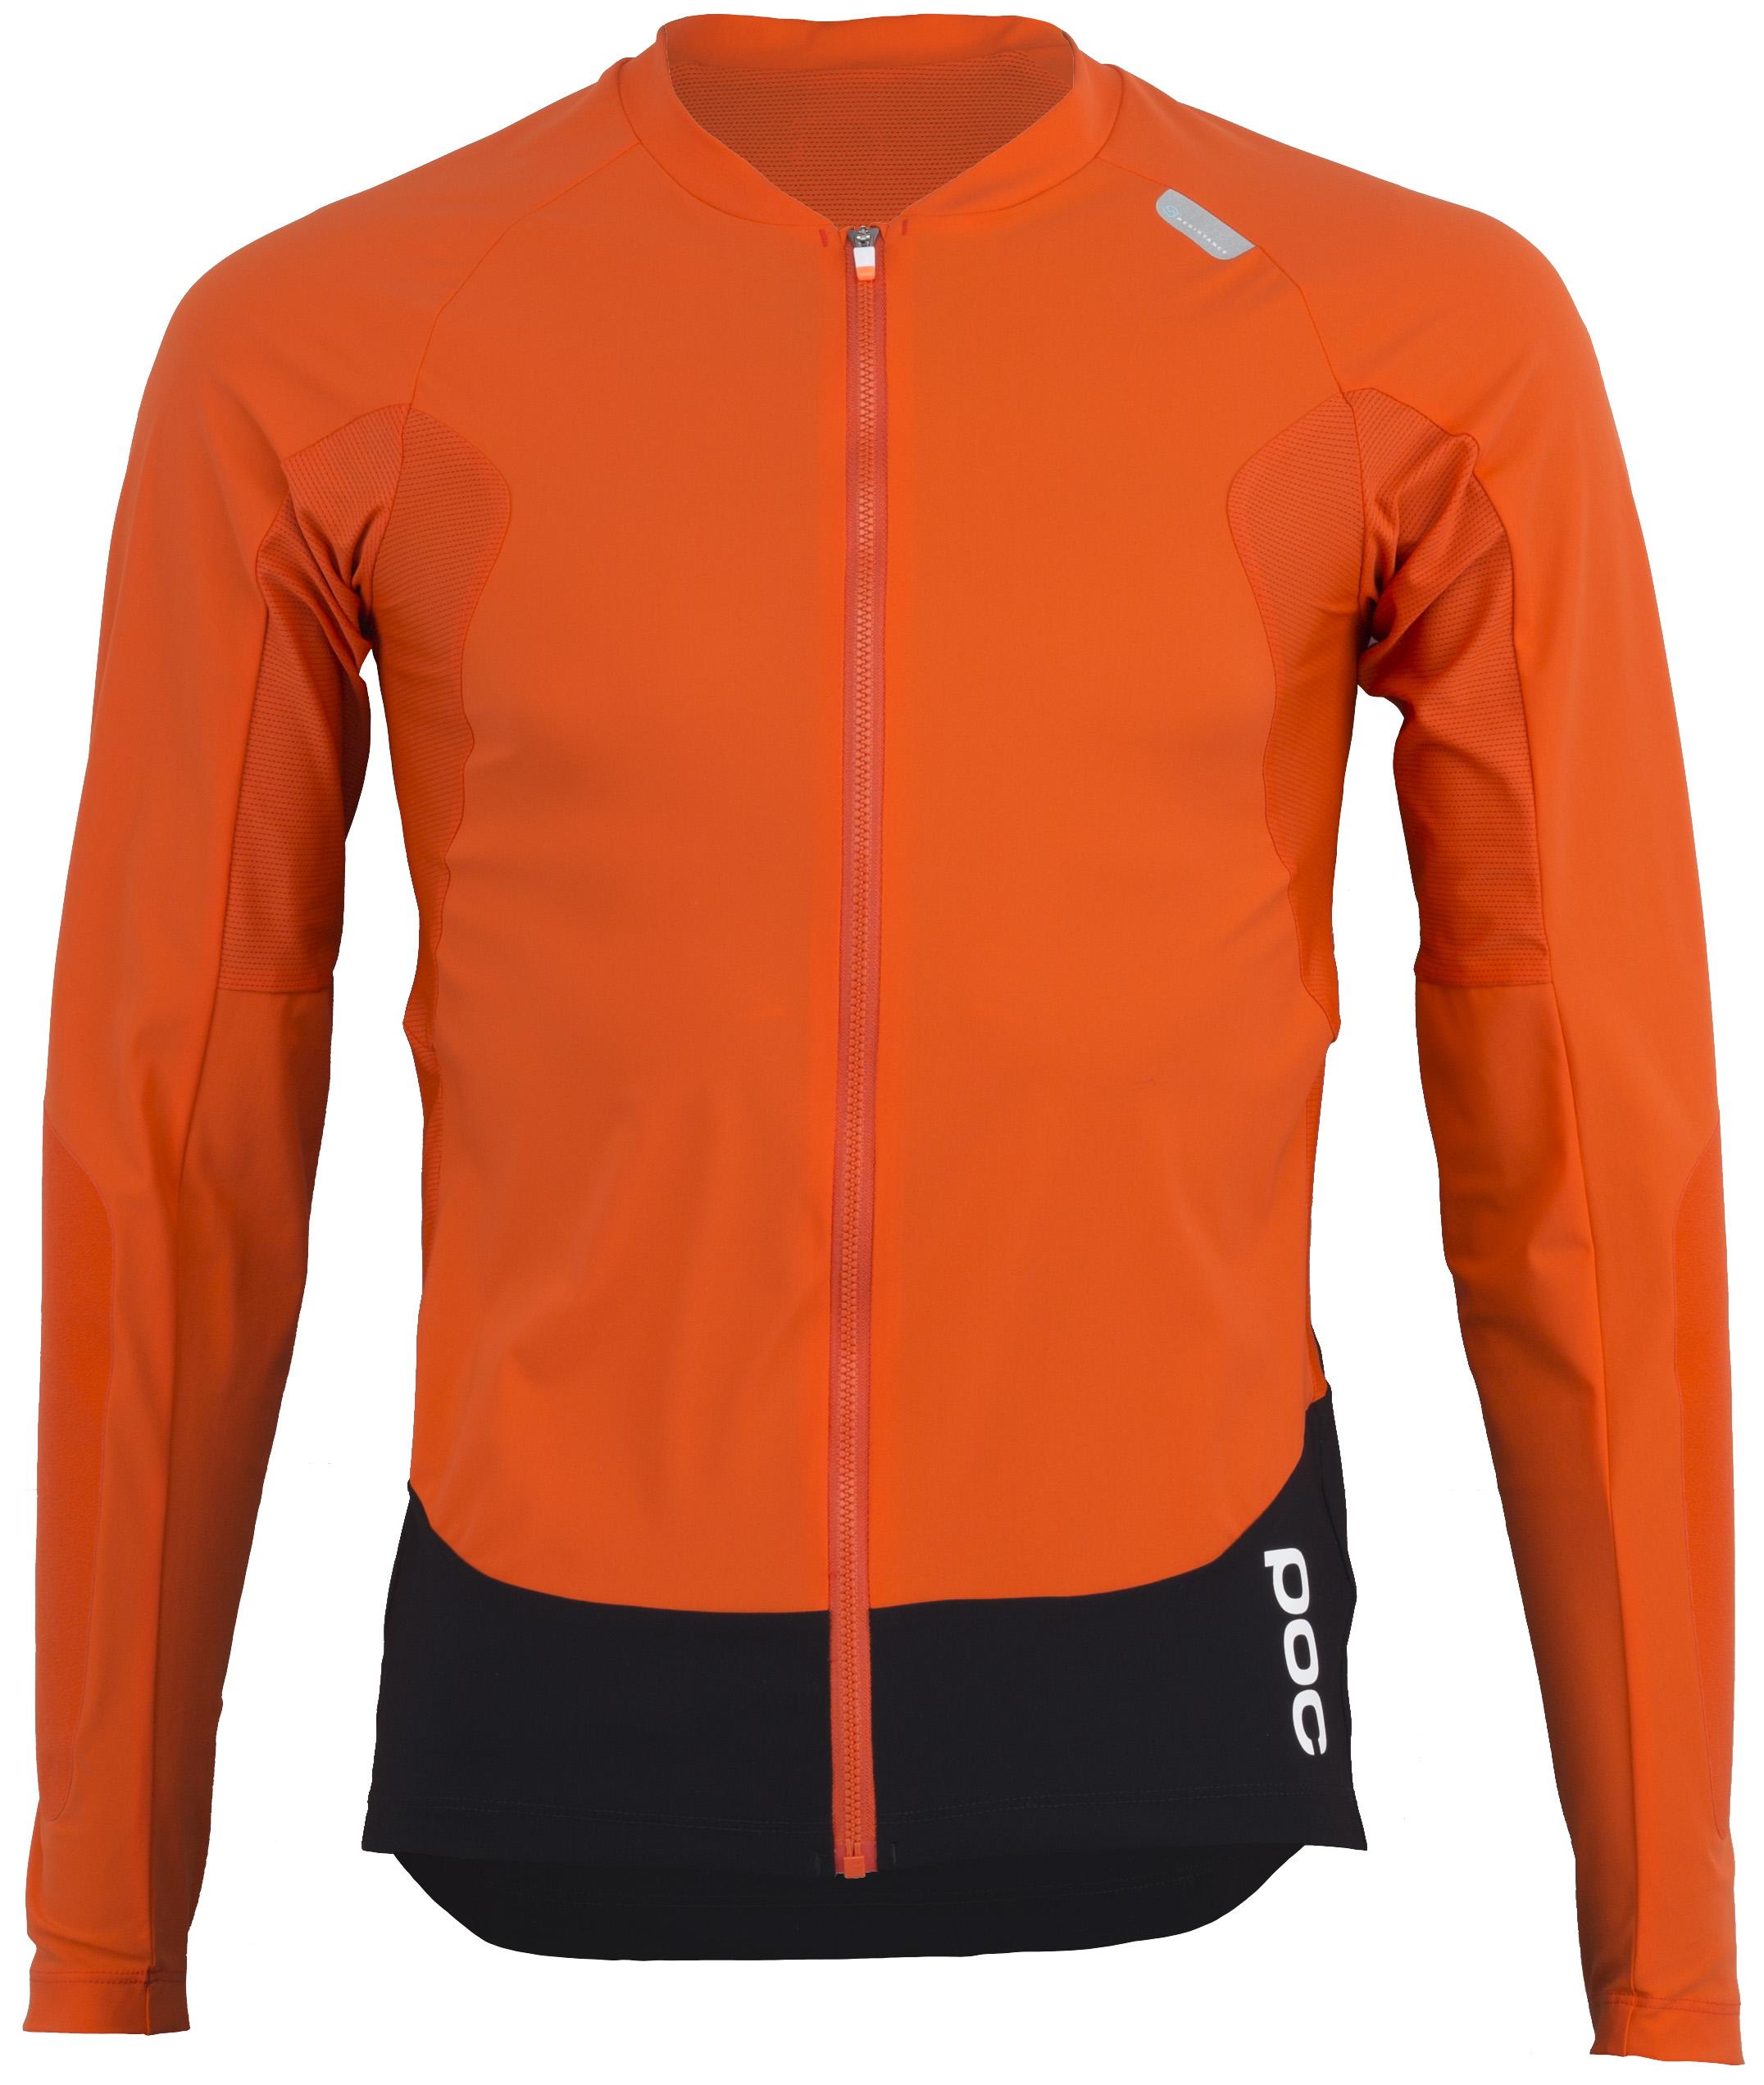 POC Resistance Pro Enduro LS Jersey Men's Size Small in Bullvalene Orange